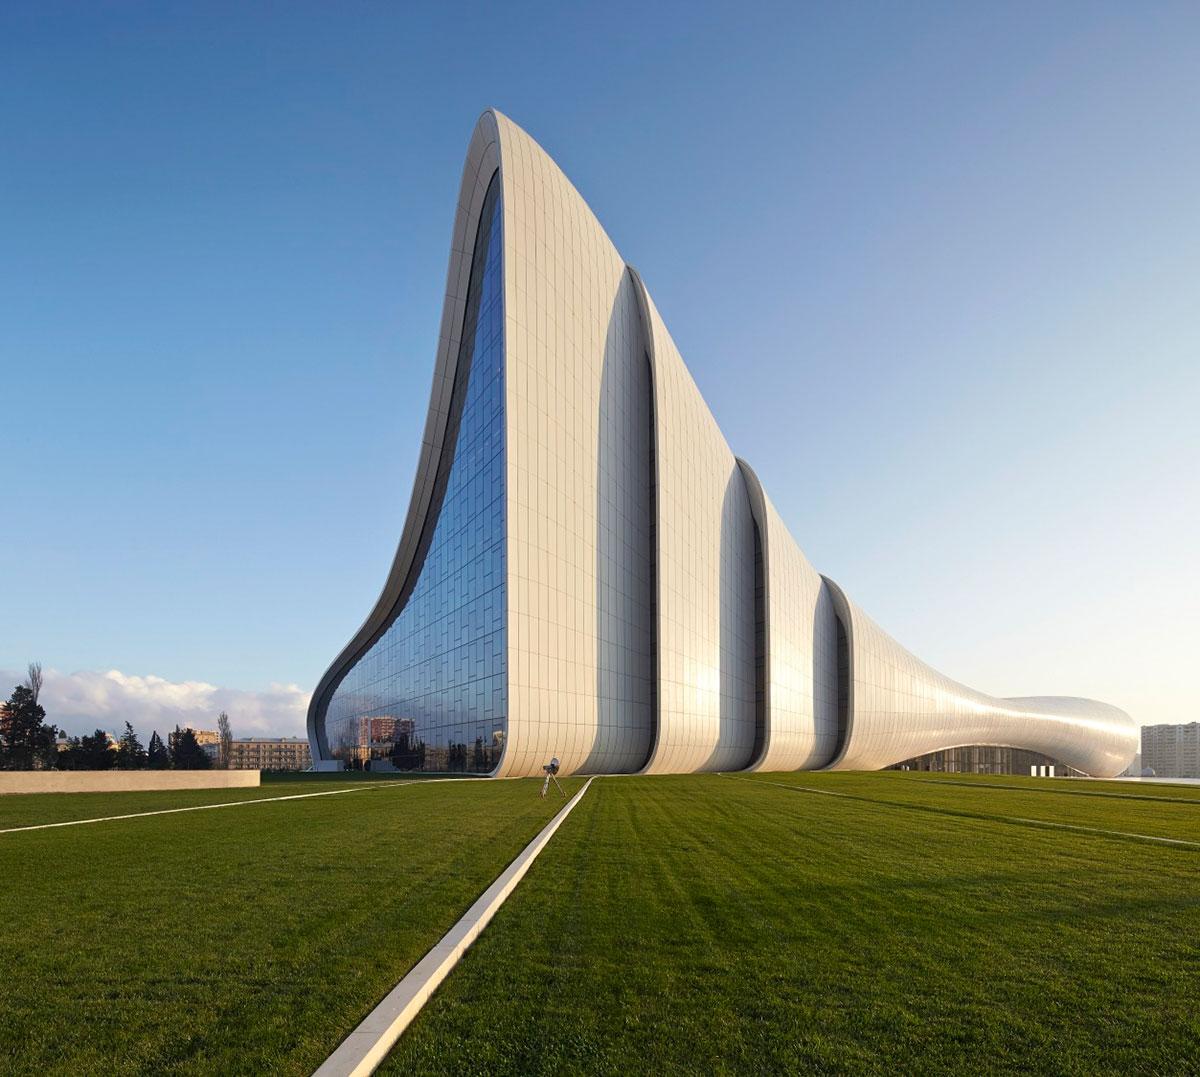 Zaha-Hadid-Architects_AKT-II_Heydar-Alijev-Cultural-Centre_01